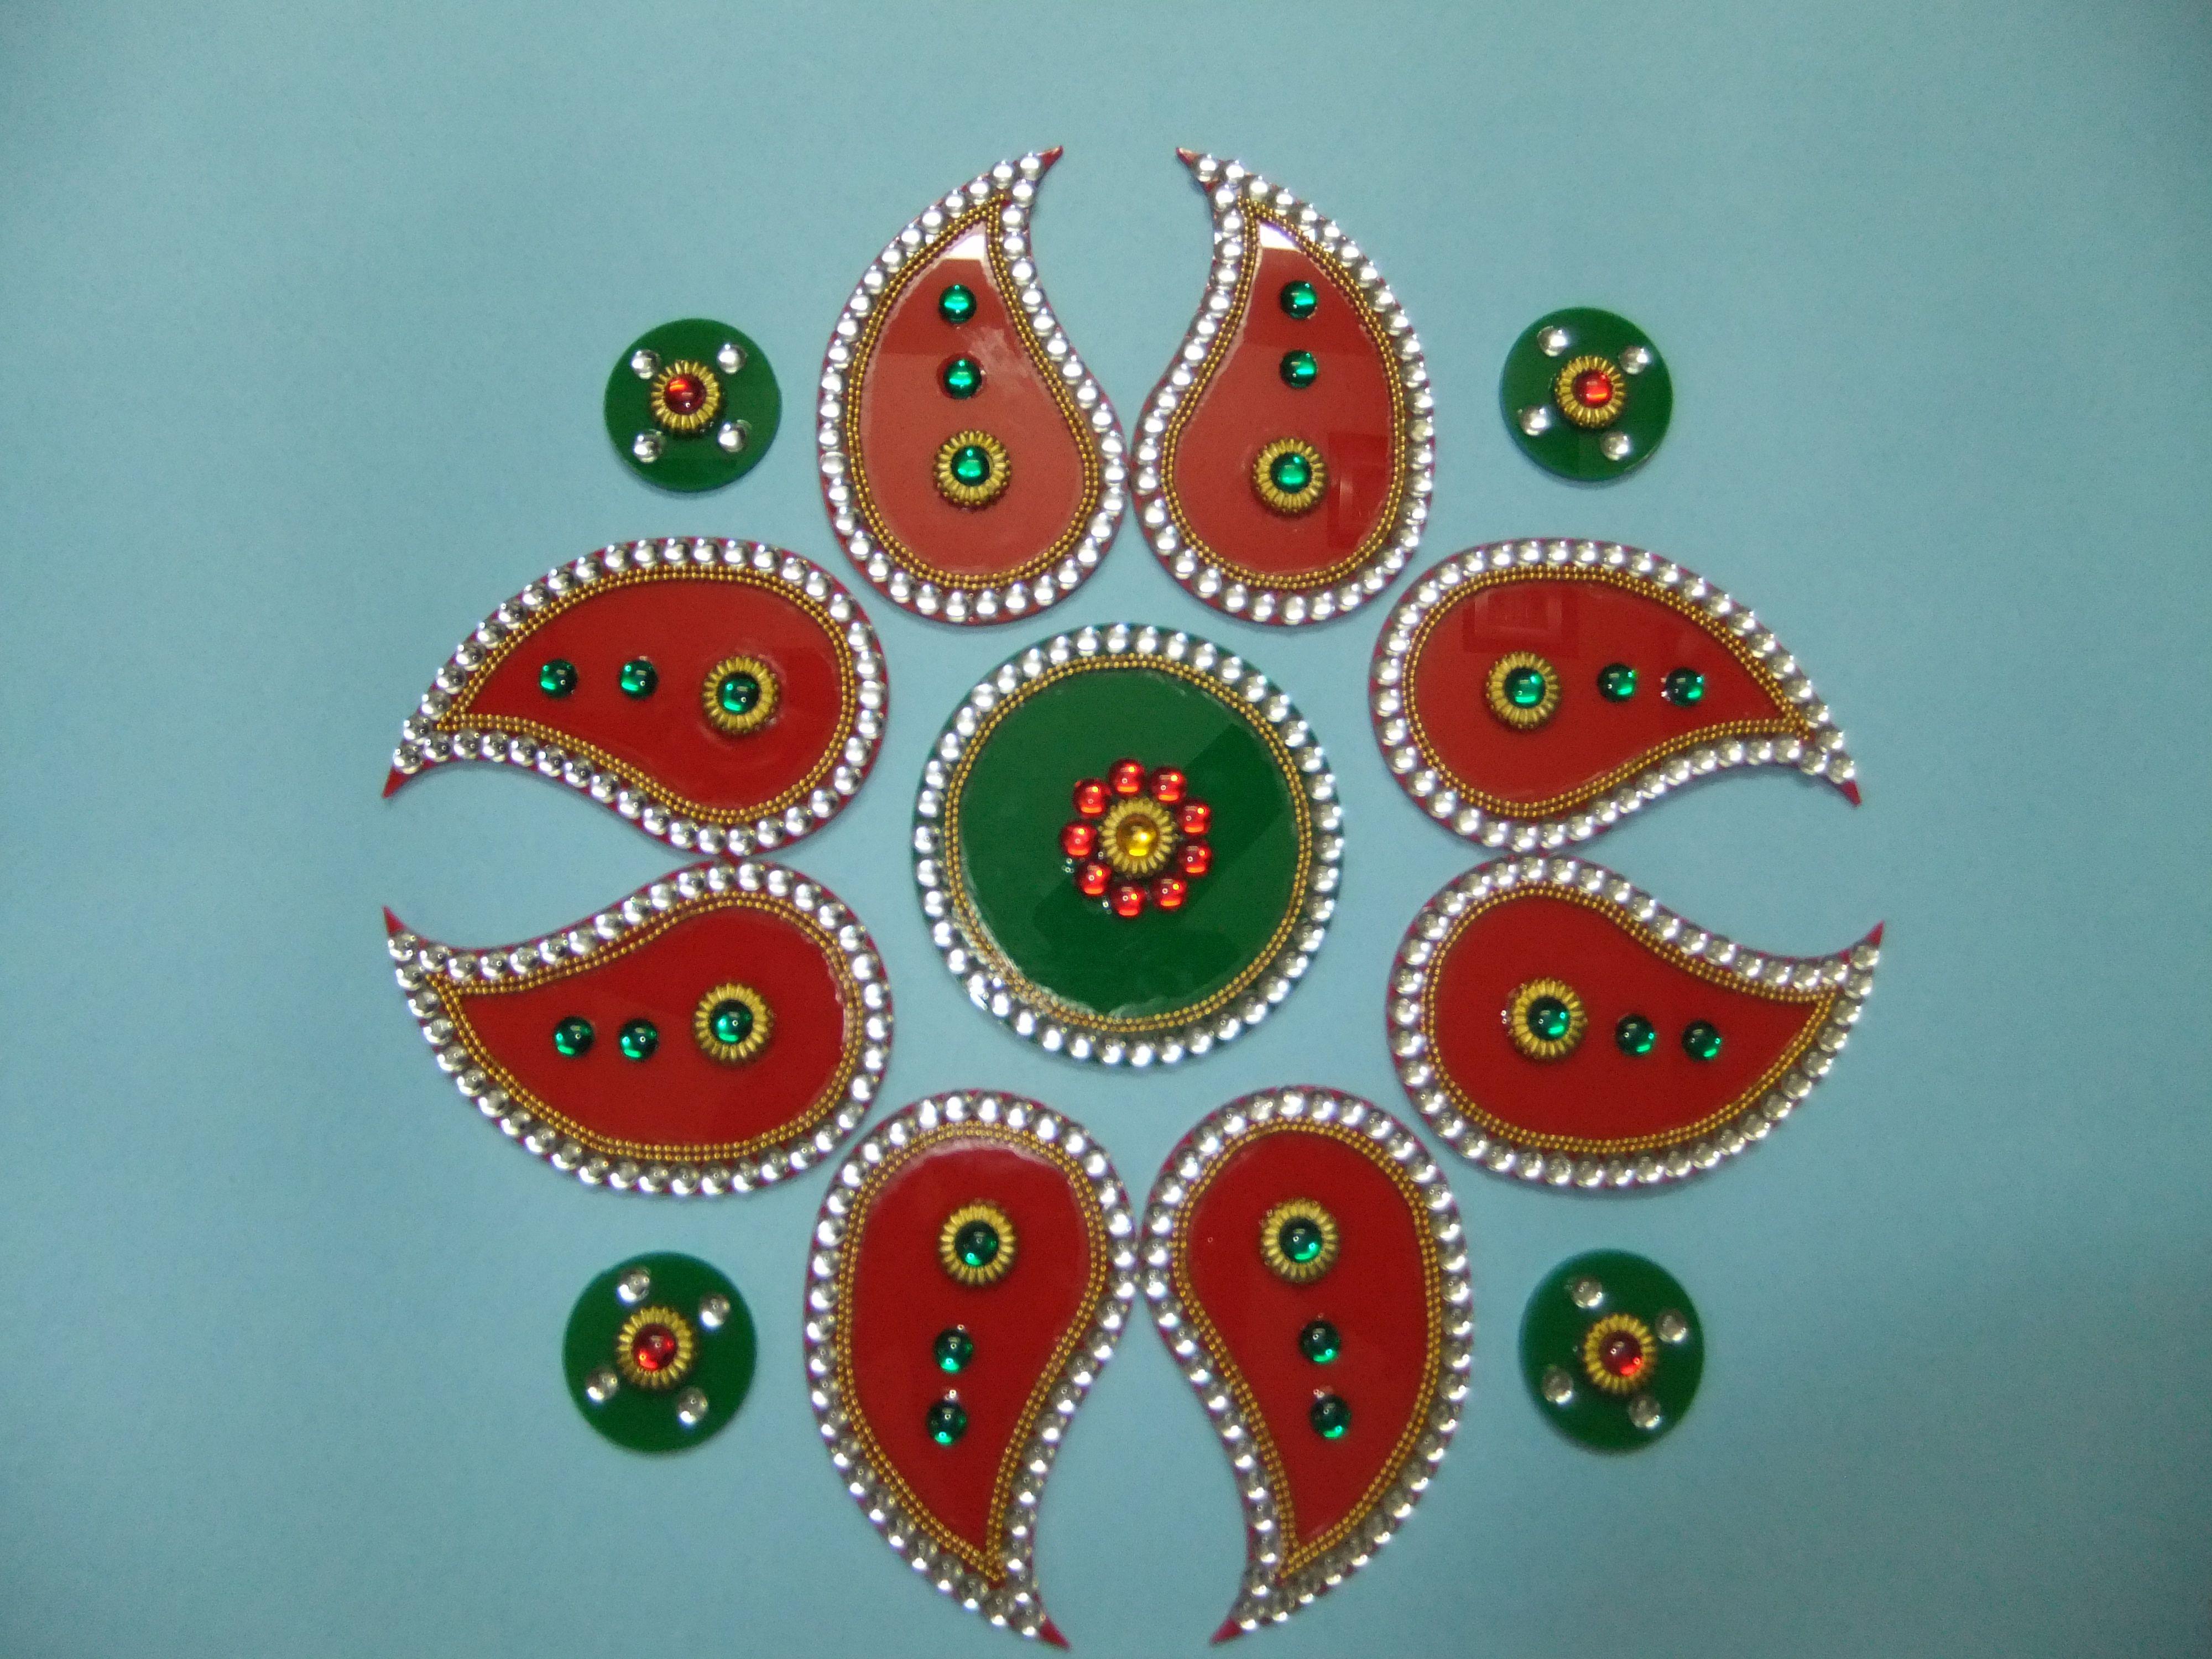 Poster design rangoli - Acrylic Rangoli Designs Patterns For Diwali